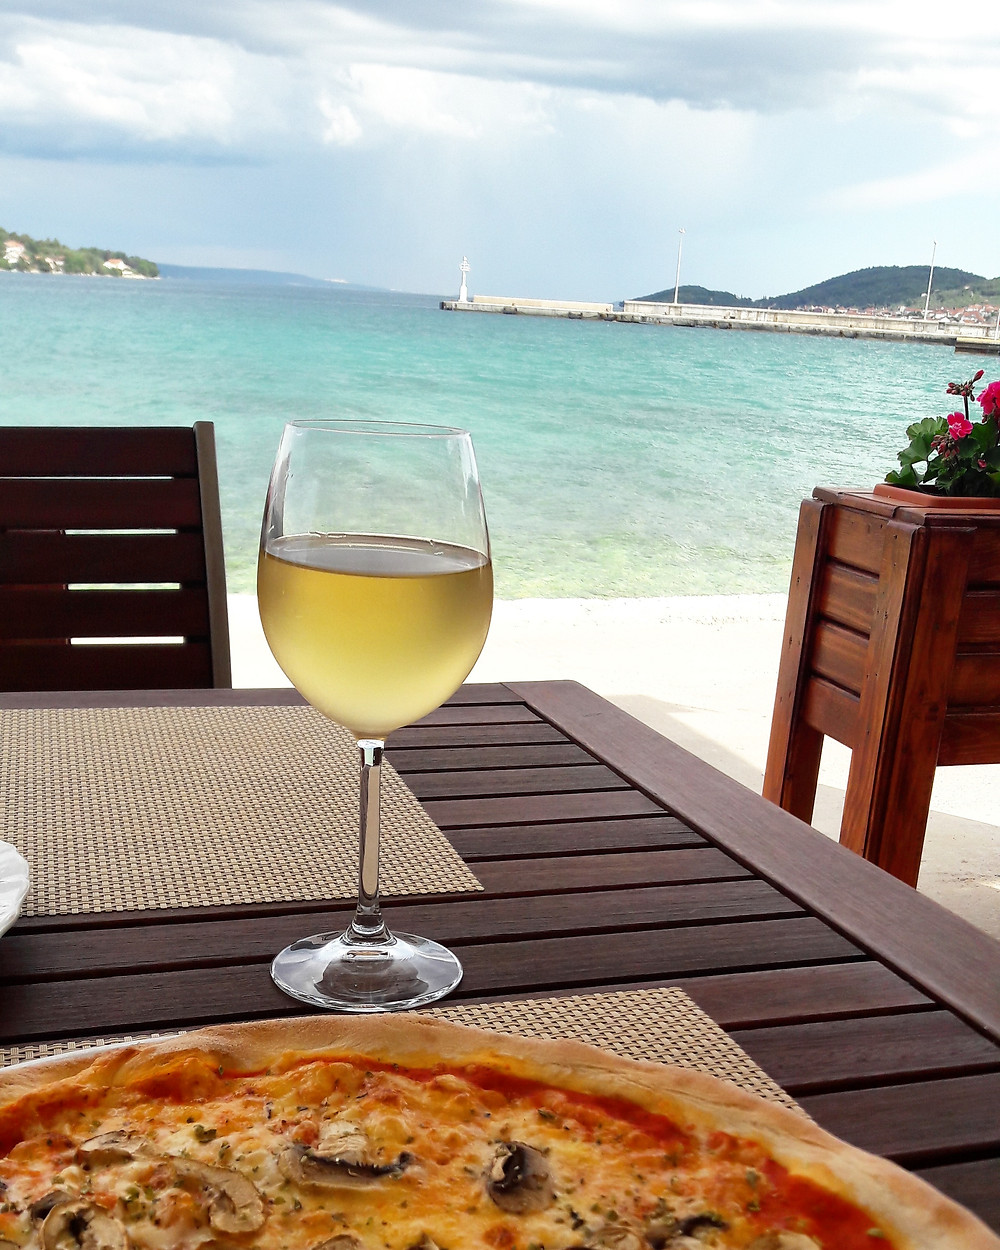 croatian white wine by the beach